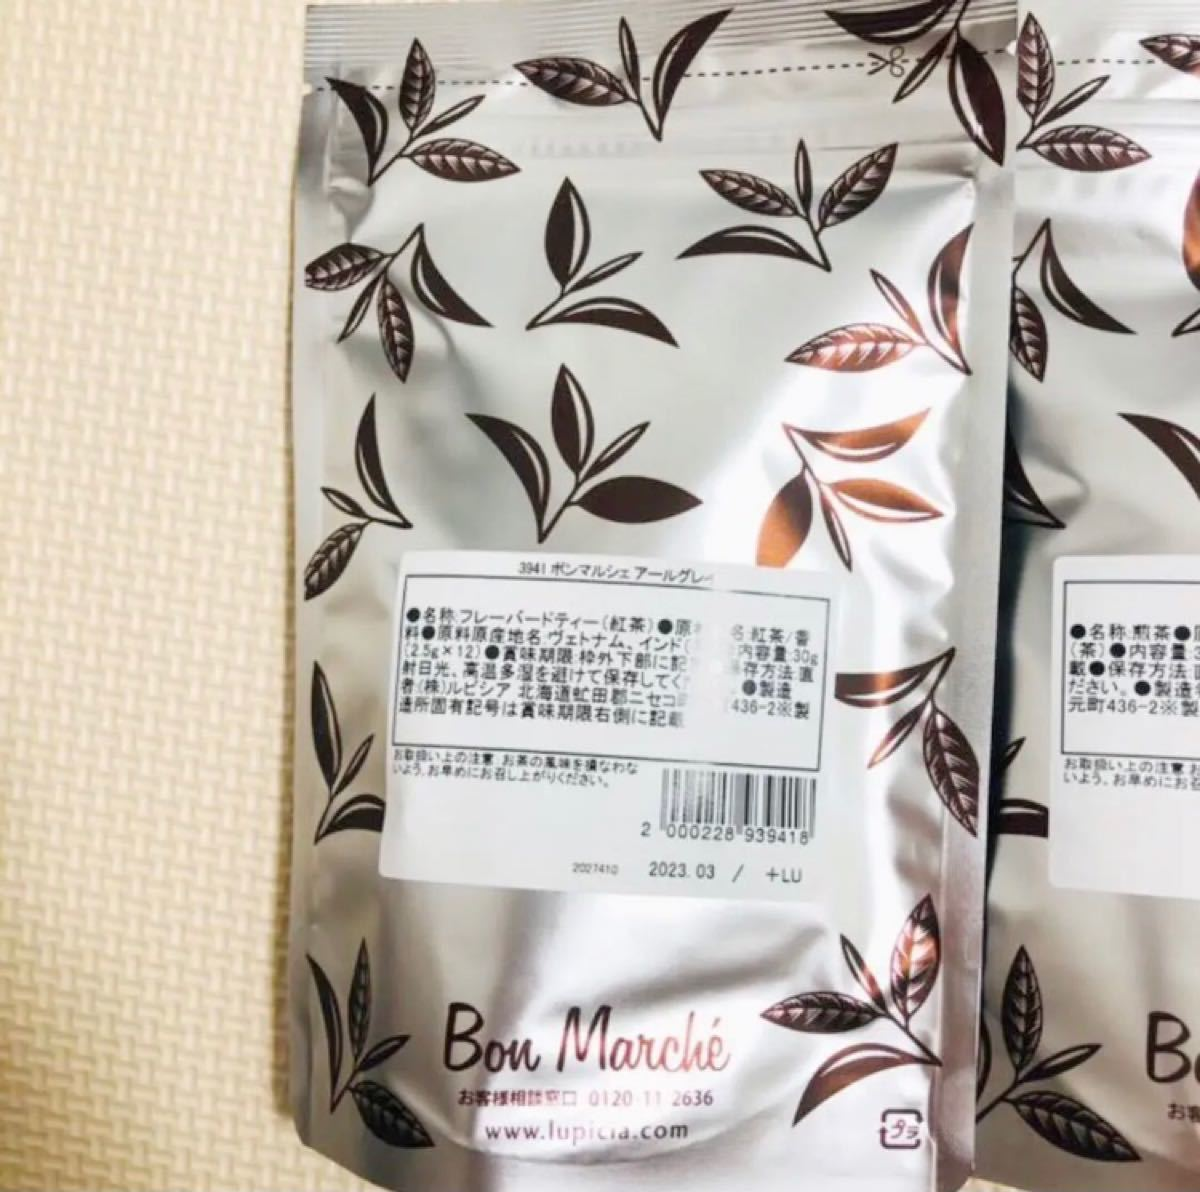 LUPICIA 紅茶緑茶ルイボス3点 アールグレイ 深蒸し煎茶 ルイボスティー